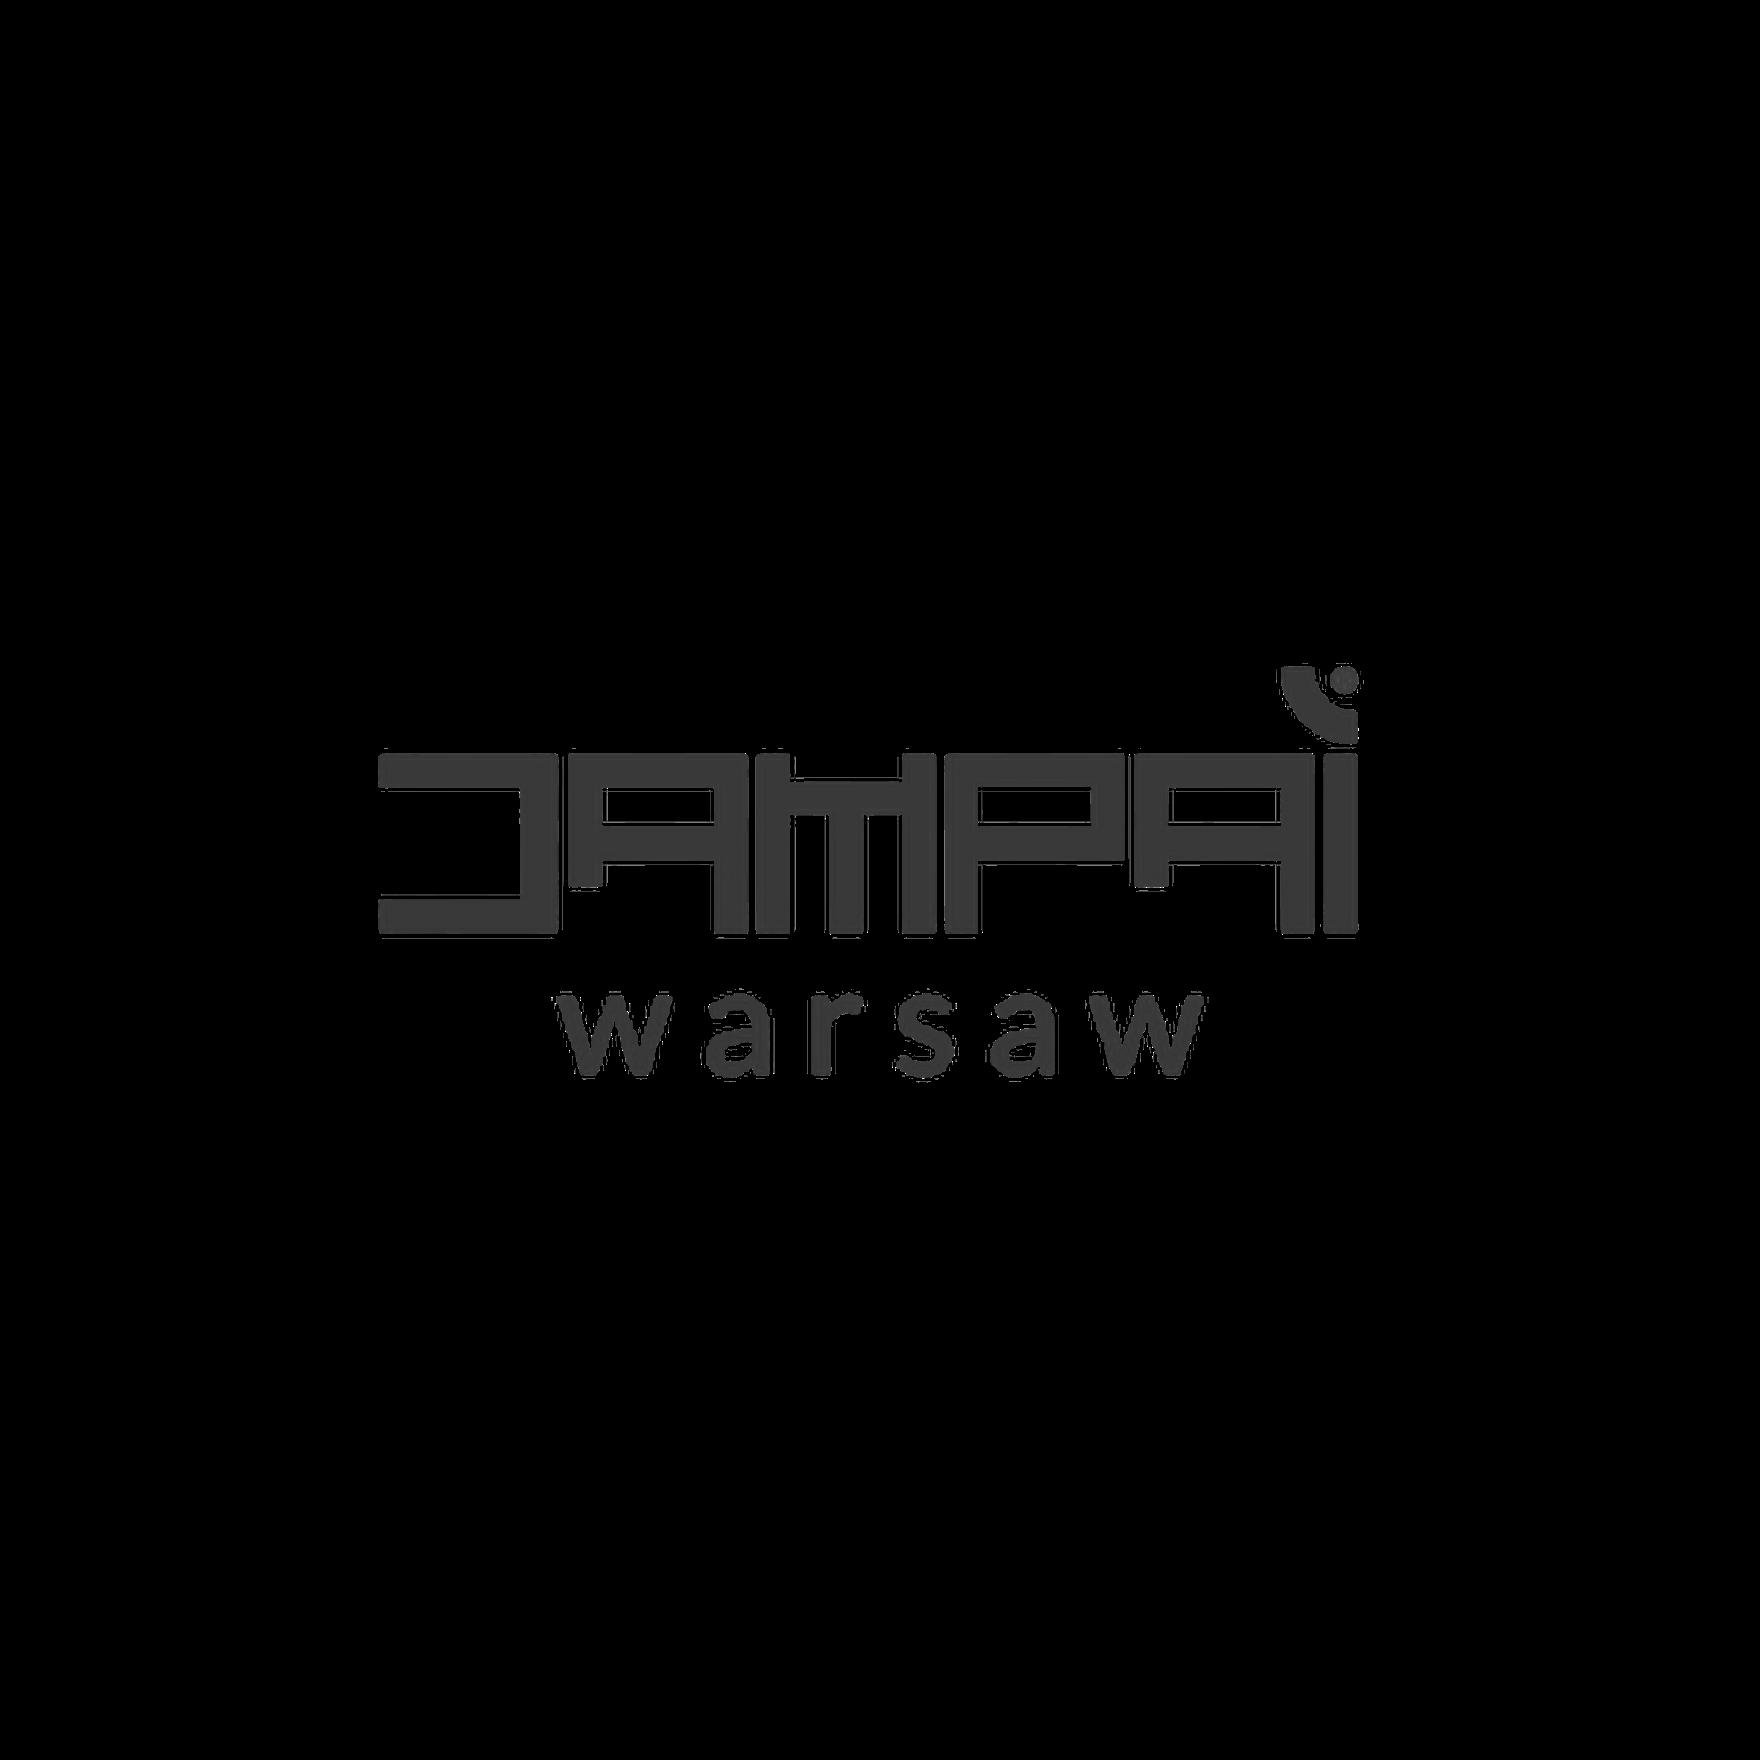 Dampai Warsaw